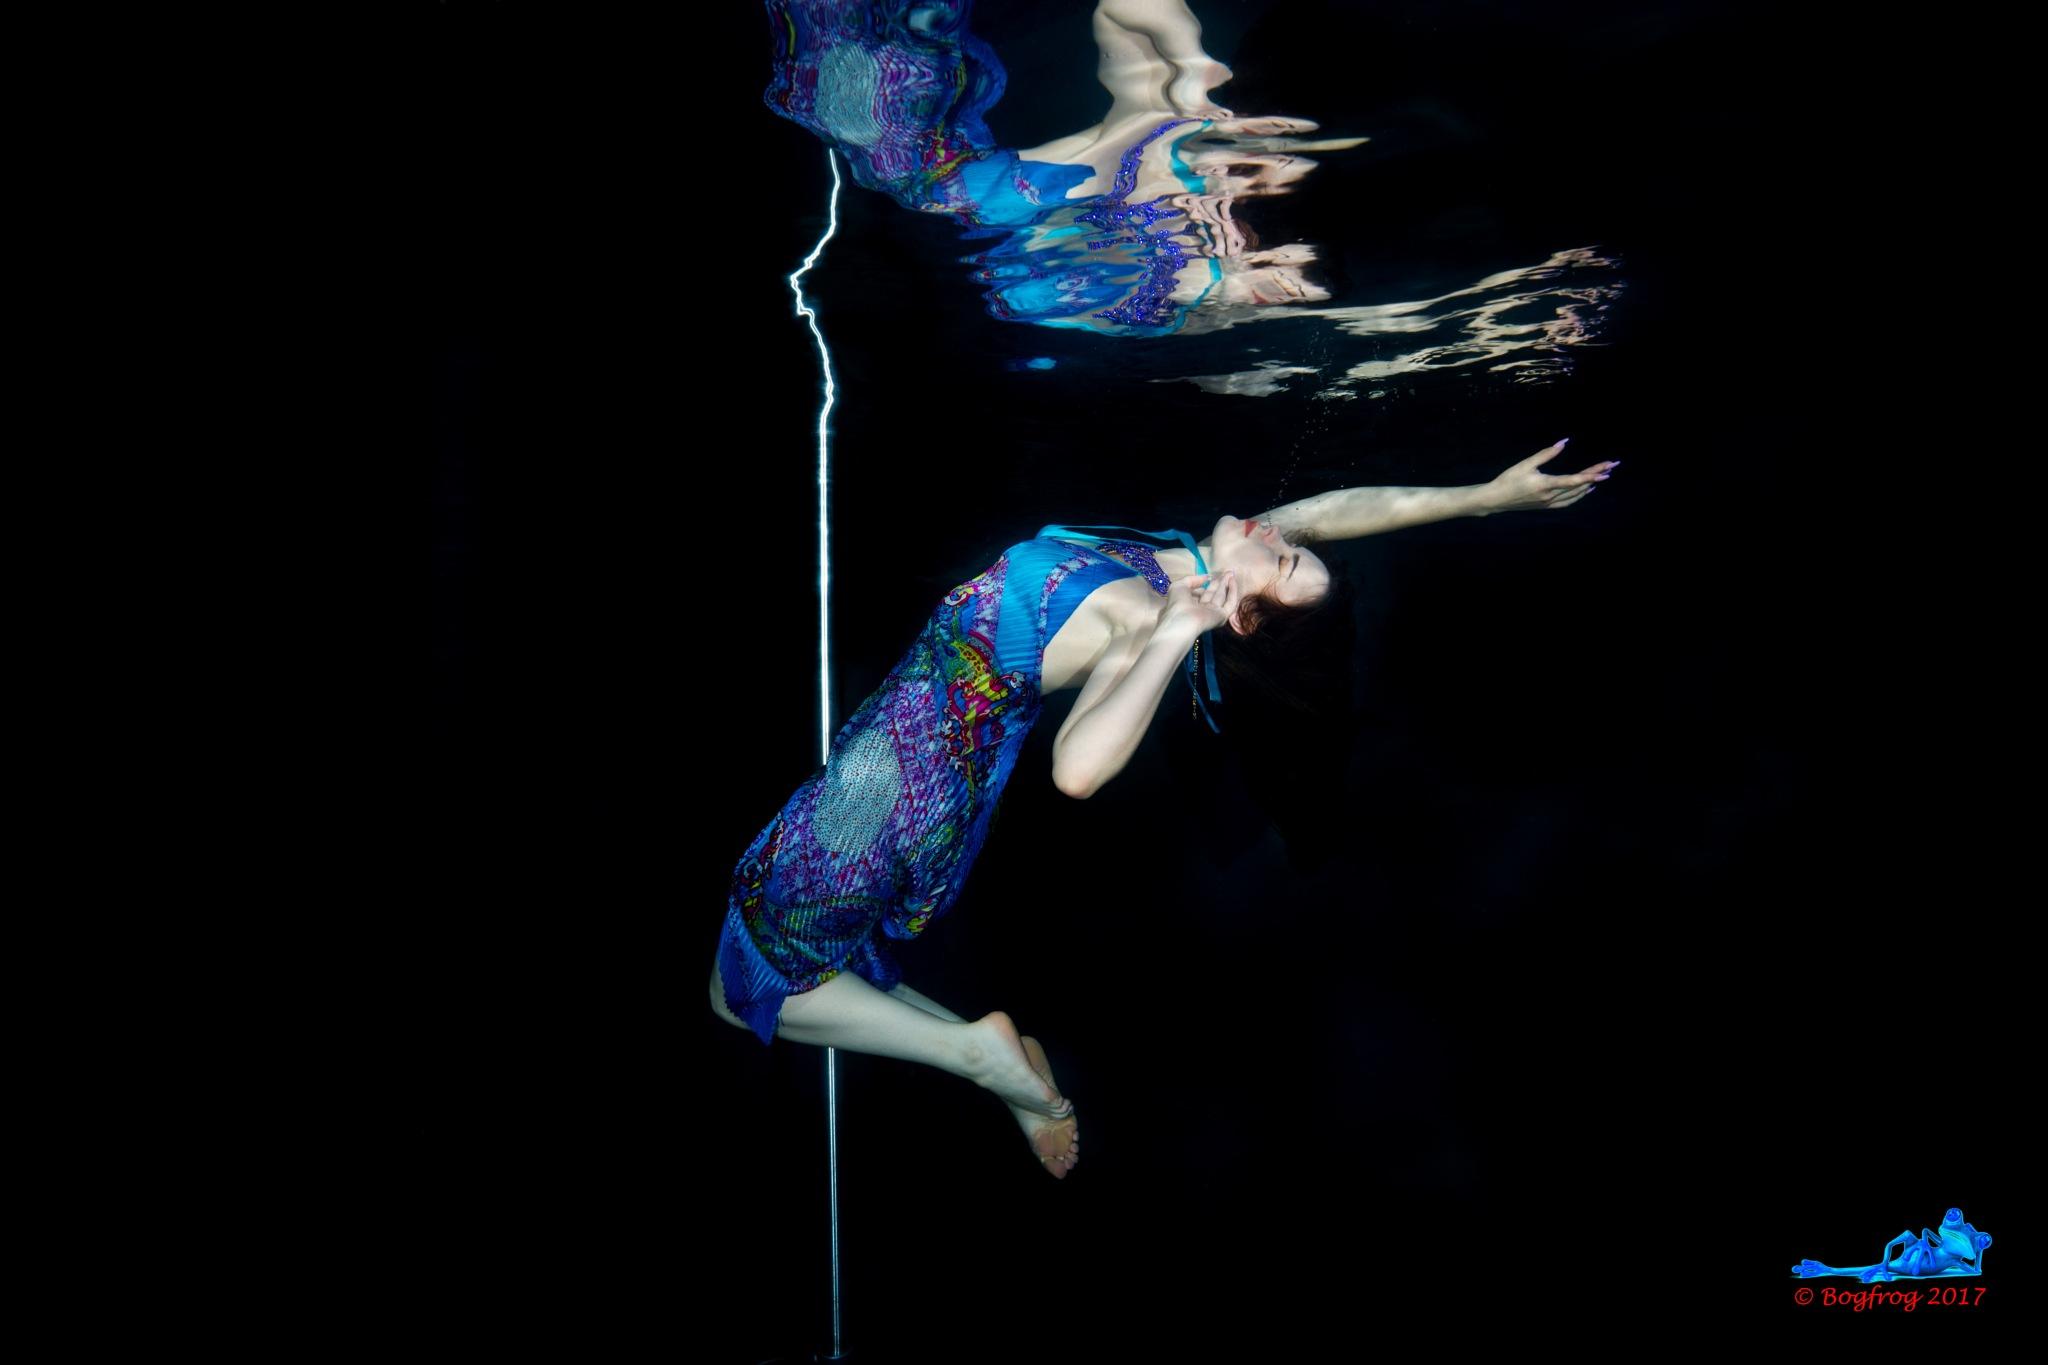 Blue Dress Underwater by Bogfrog